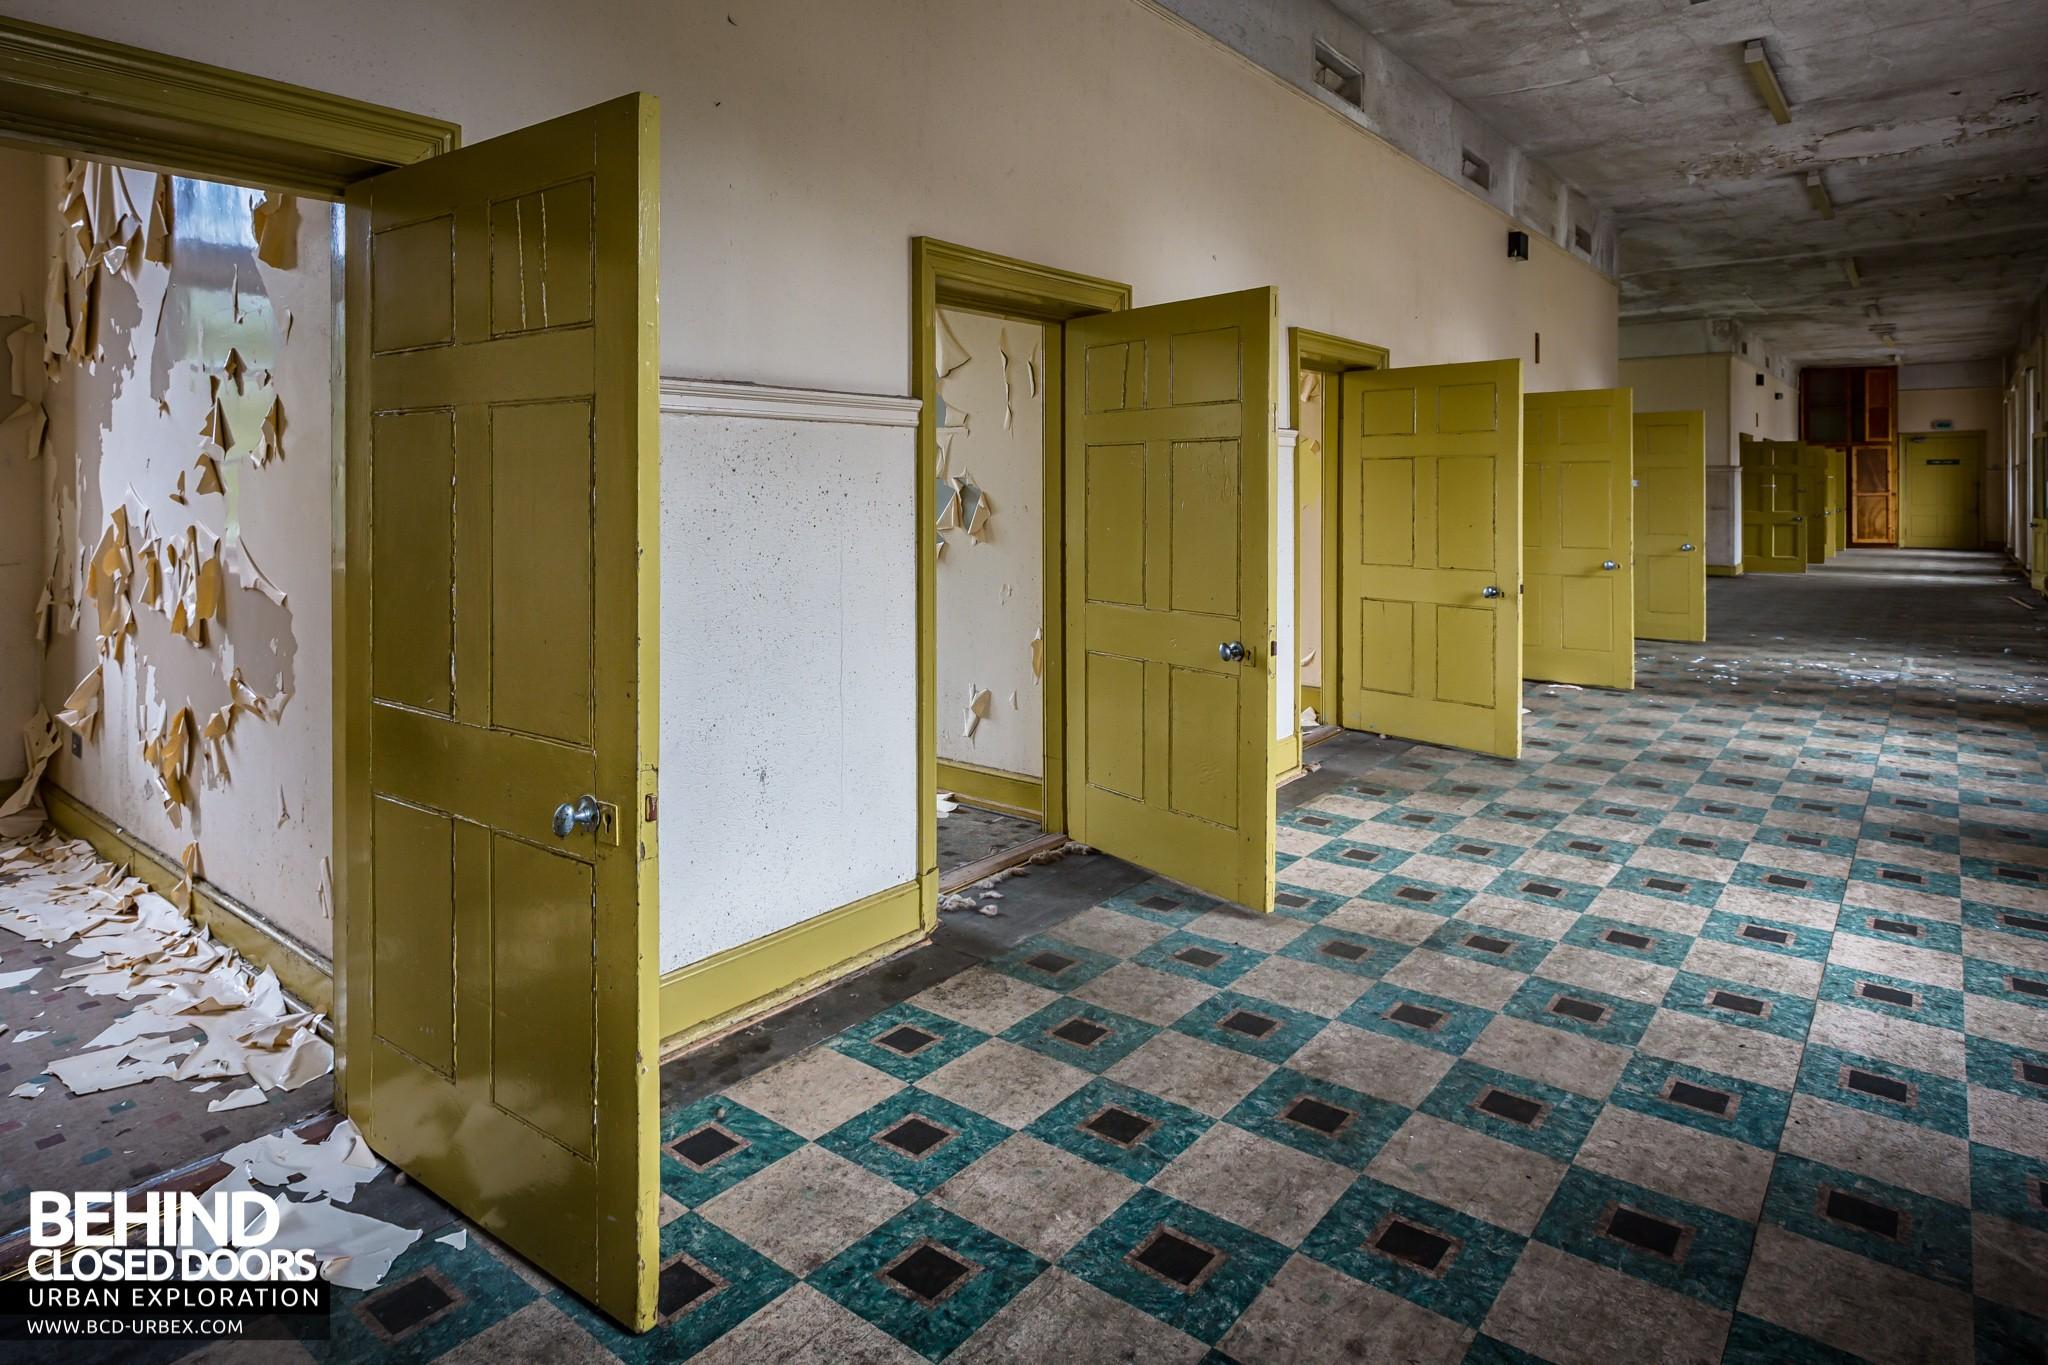 Sunnyside Hospital Montrose Asylum Scotland Urbex Behind Closed Doors Urban Exploring Abandoned Locations